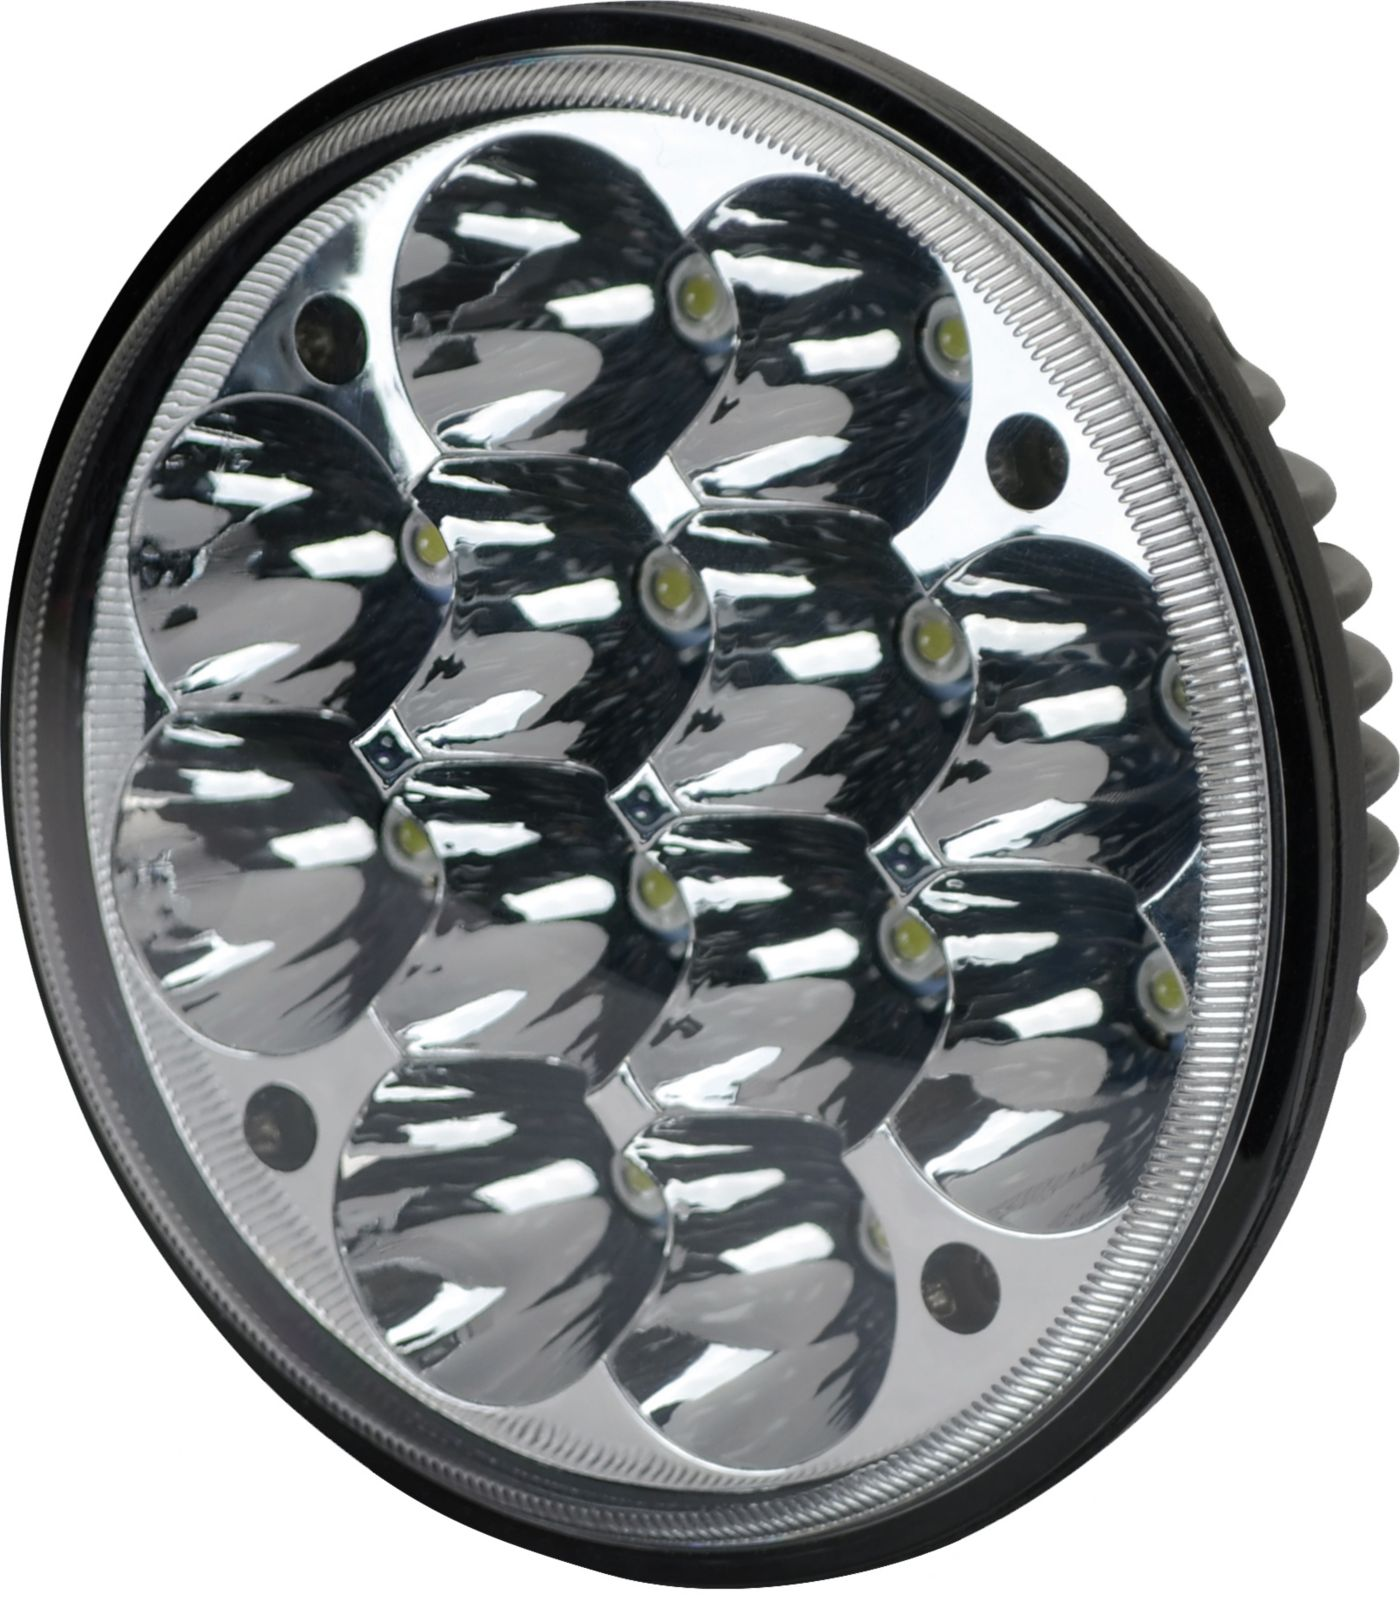 Cyclops Round Bottom Mount LED Light – 36W